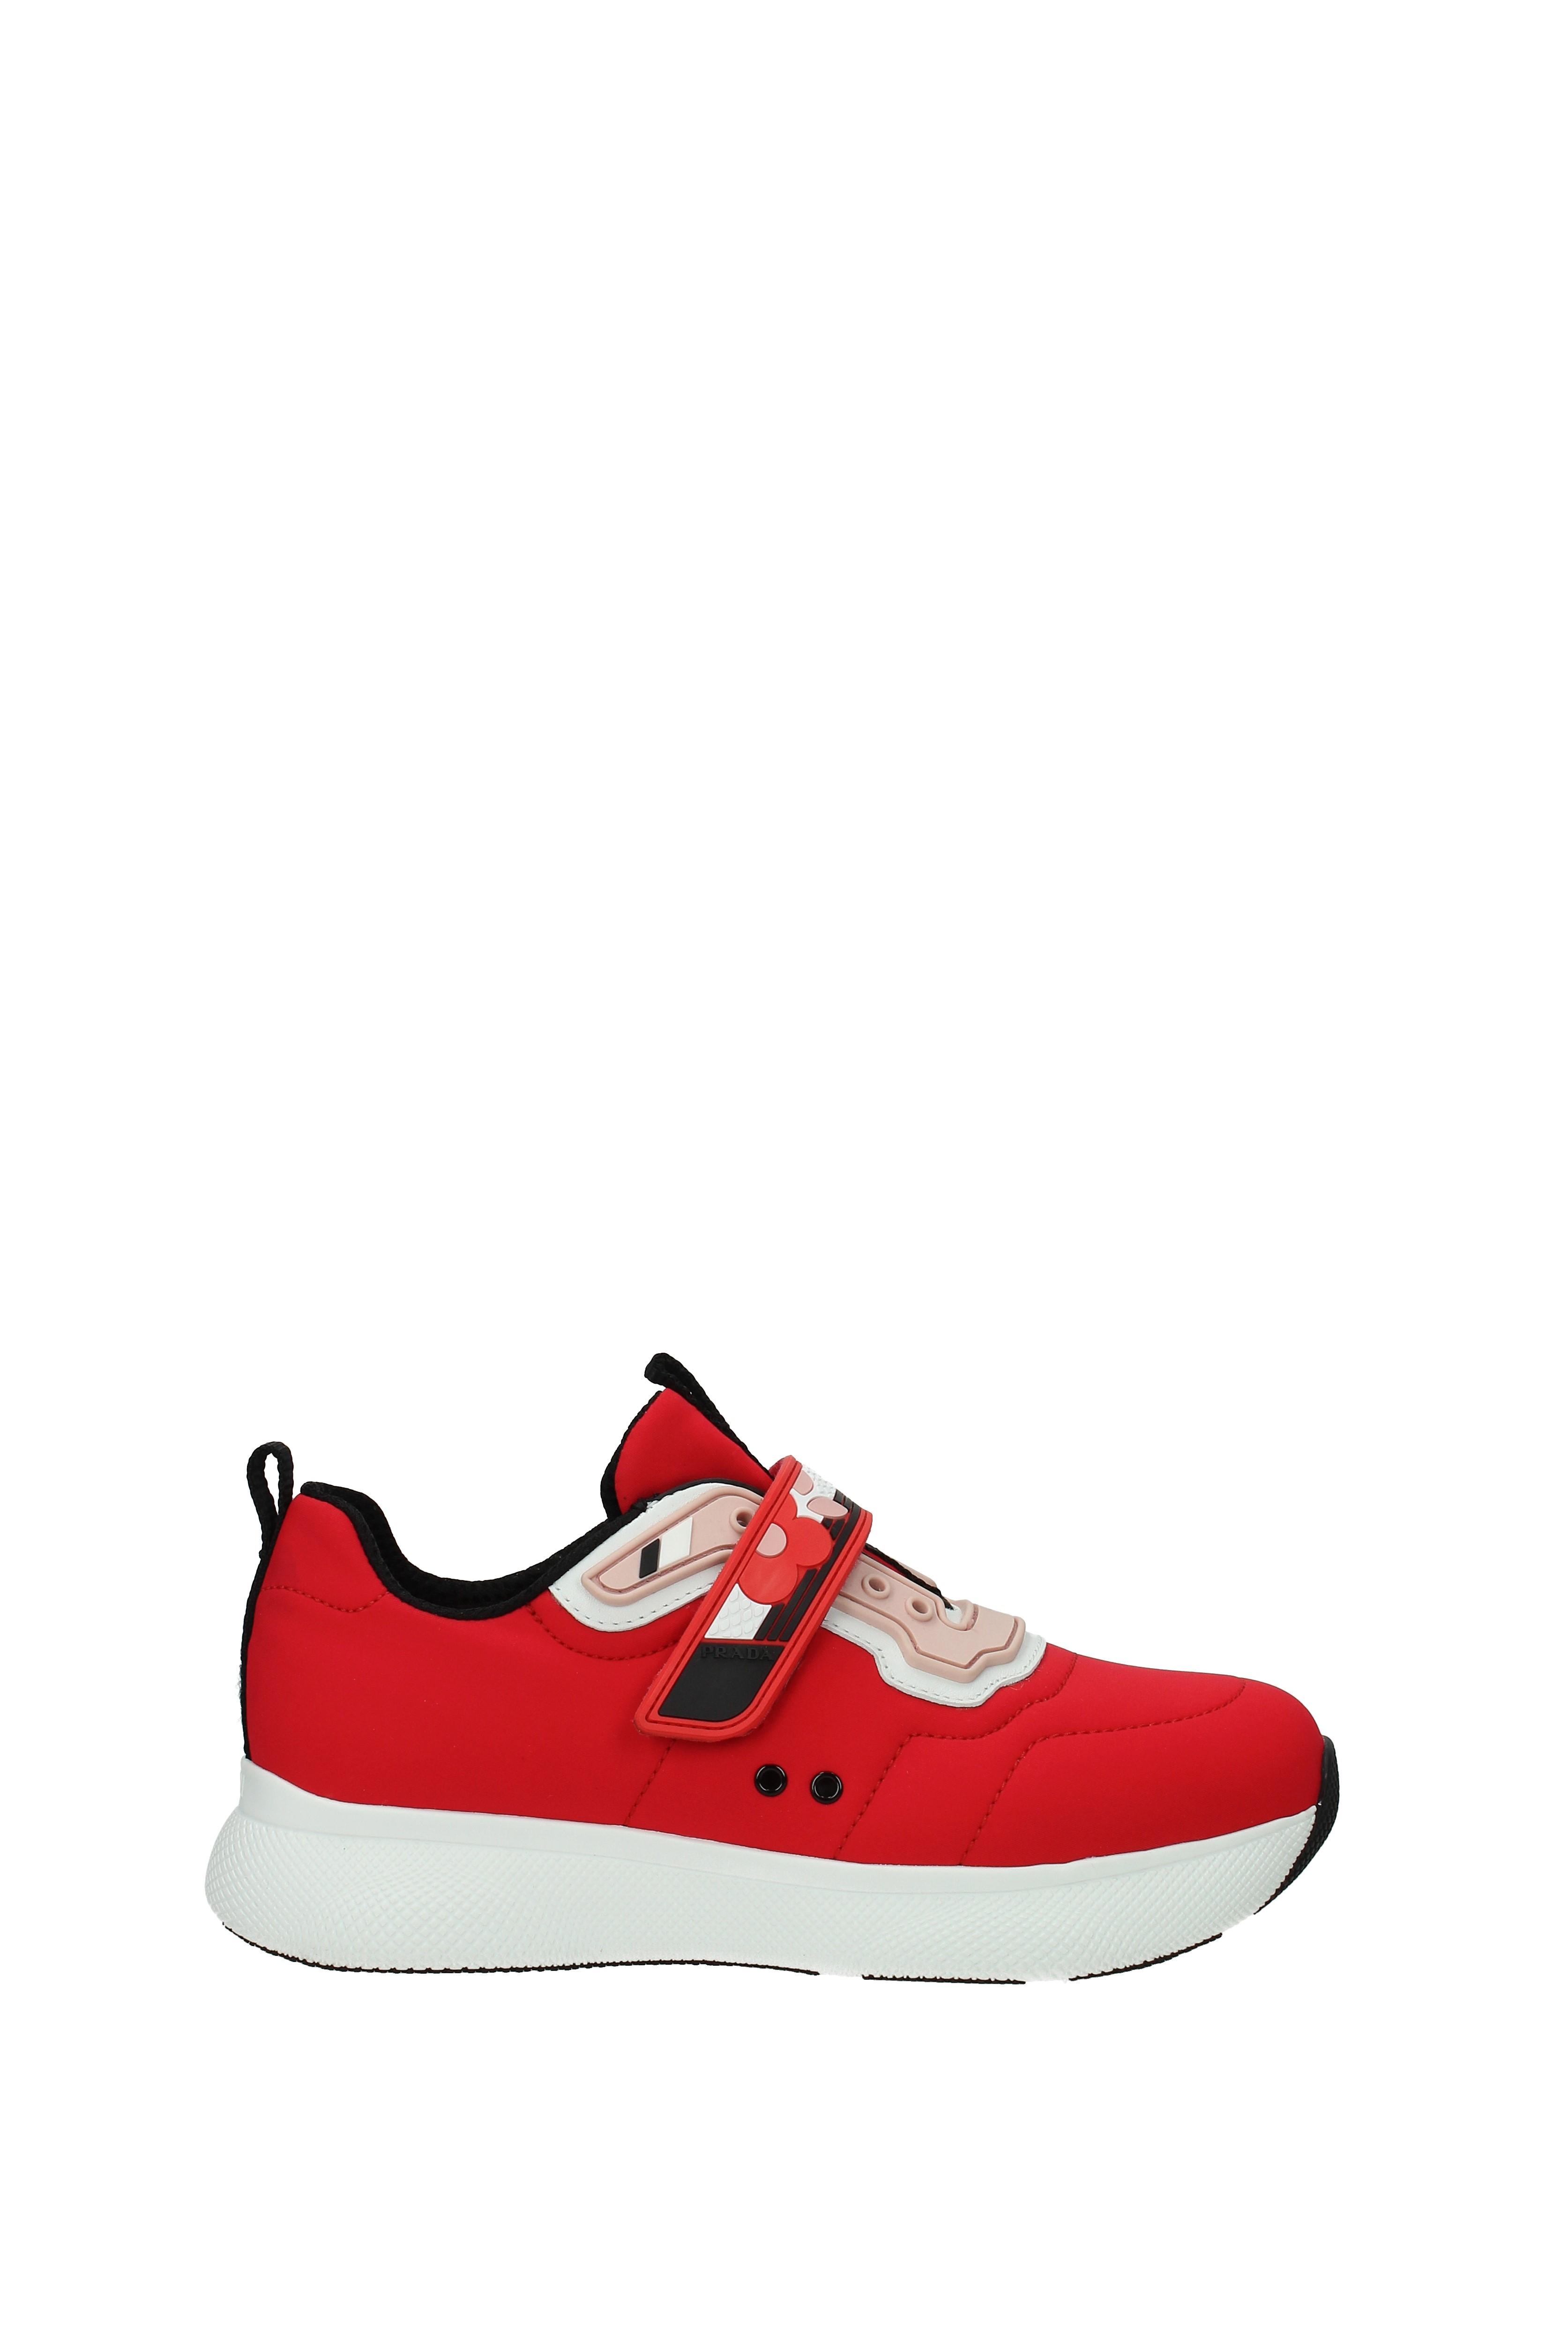 Sneakers Prada Prada Sneakers Damen - Stoff (3E6322NEOPRENE5) e38b61